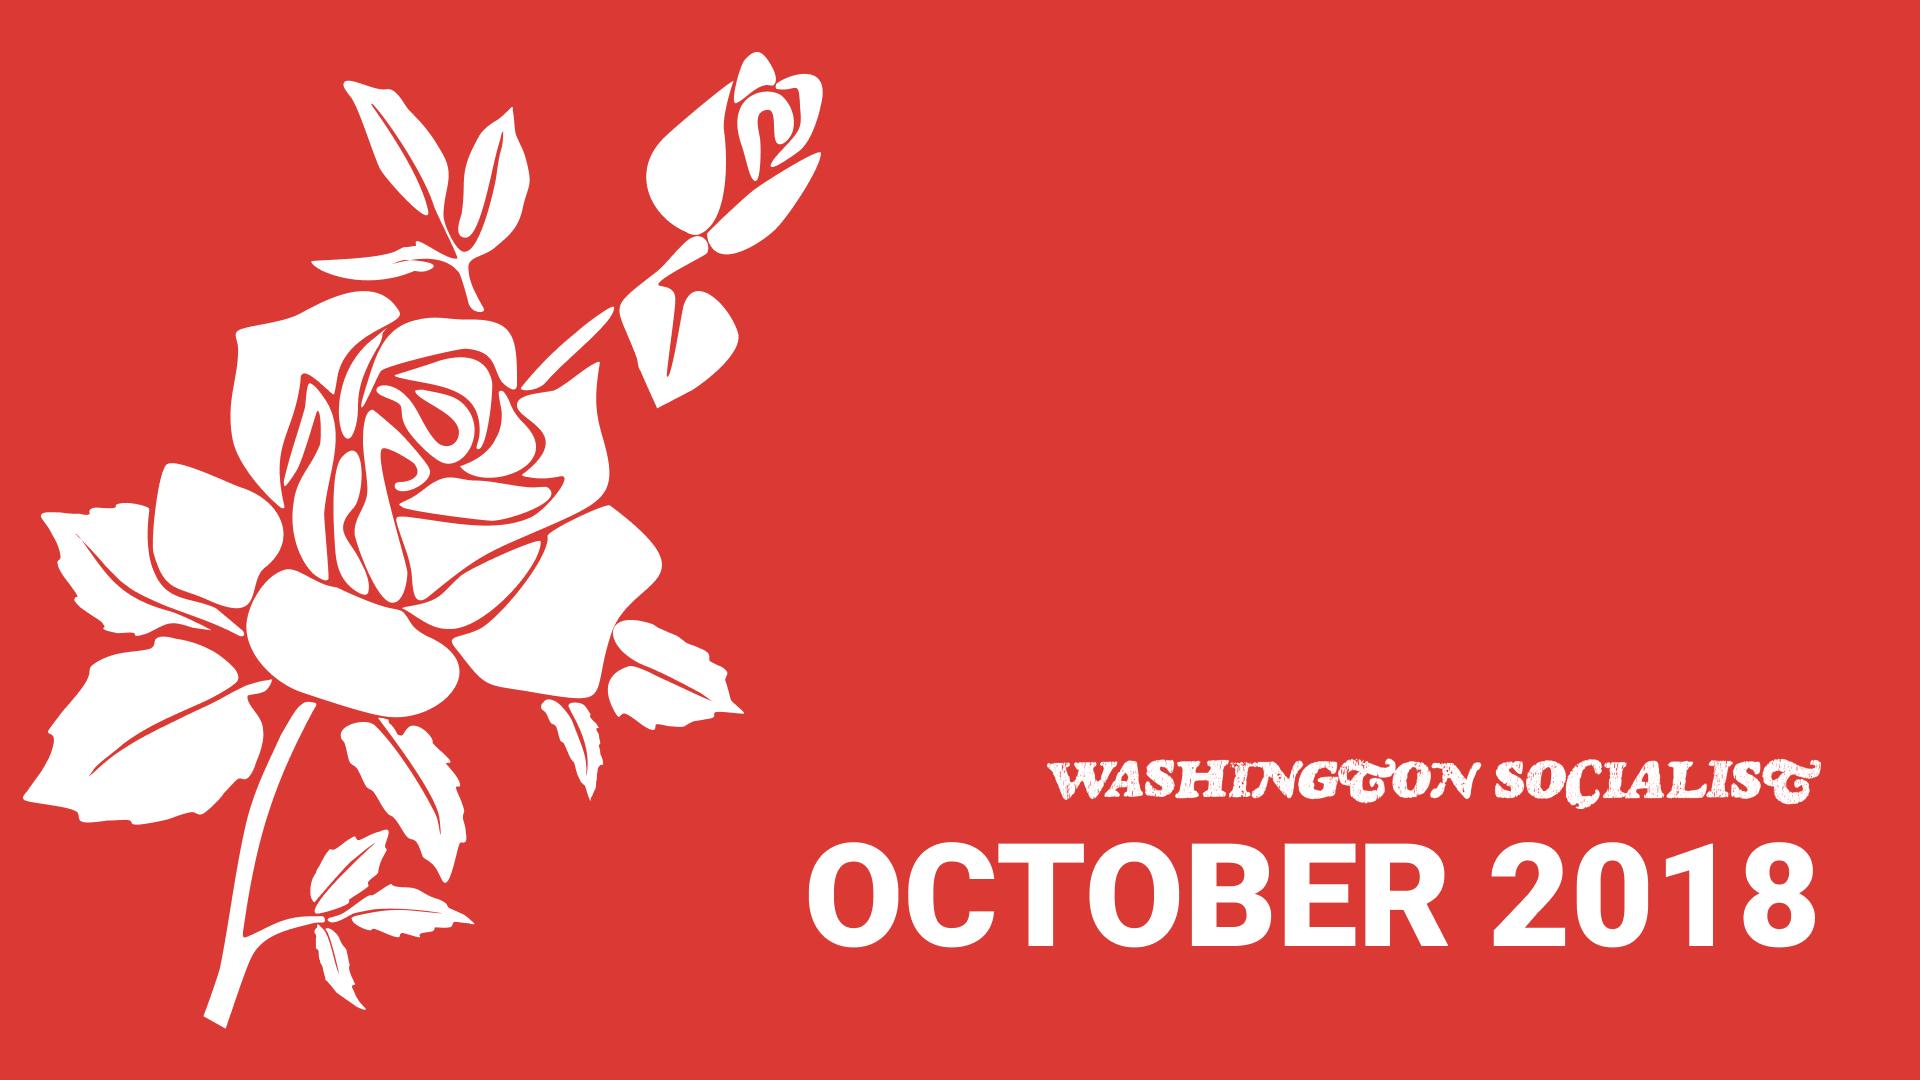 Washington Socialist Cover, October 2018